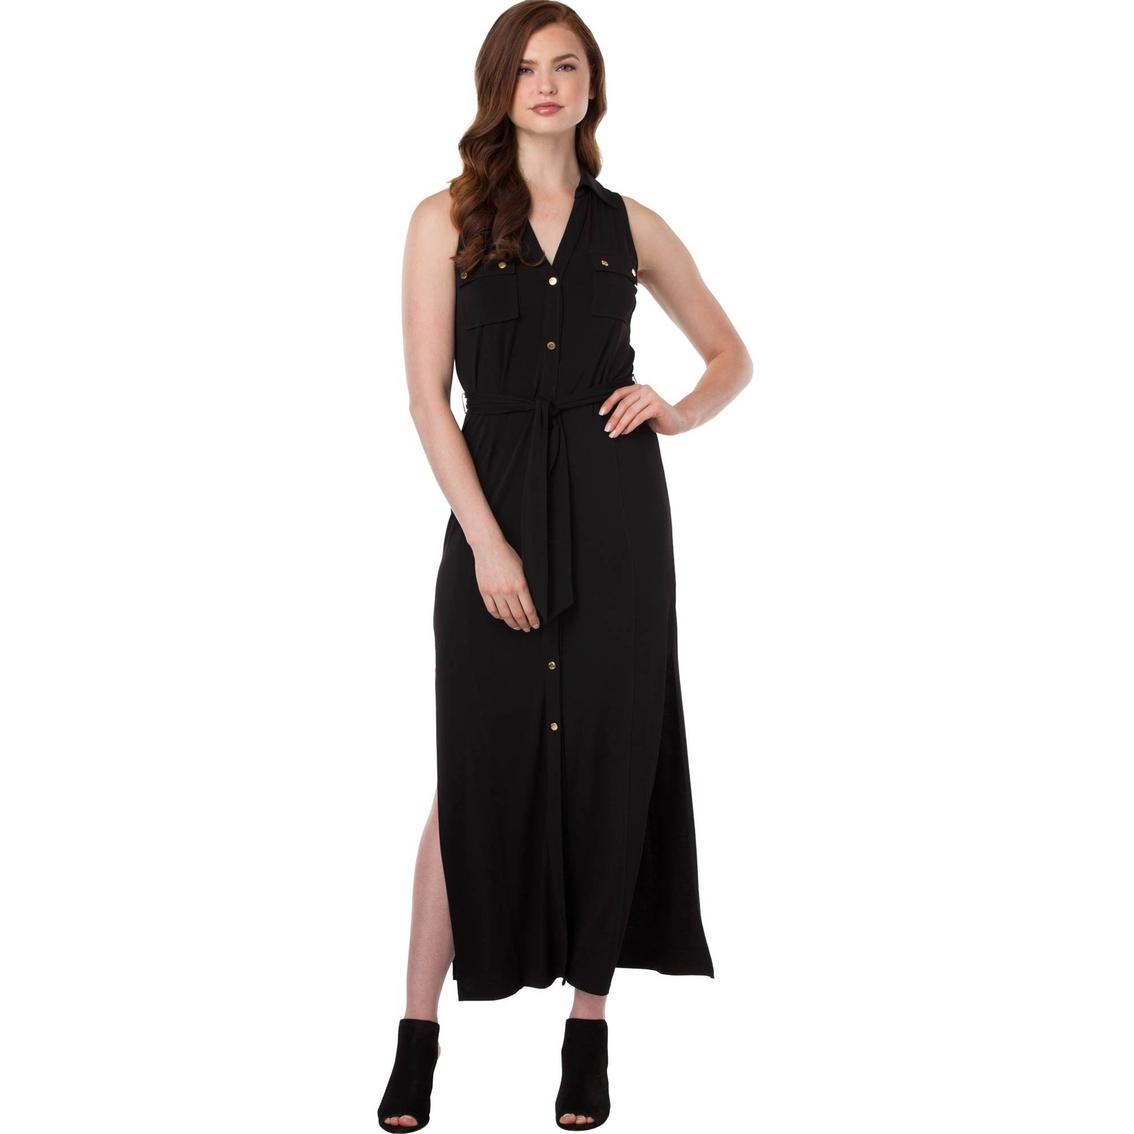 c630ef78d2b Michael Kors Petite Matte Jersey Maxi Shirt Dress | Dresses ...